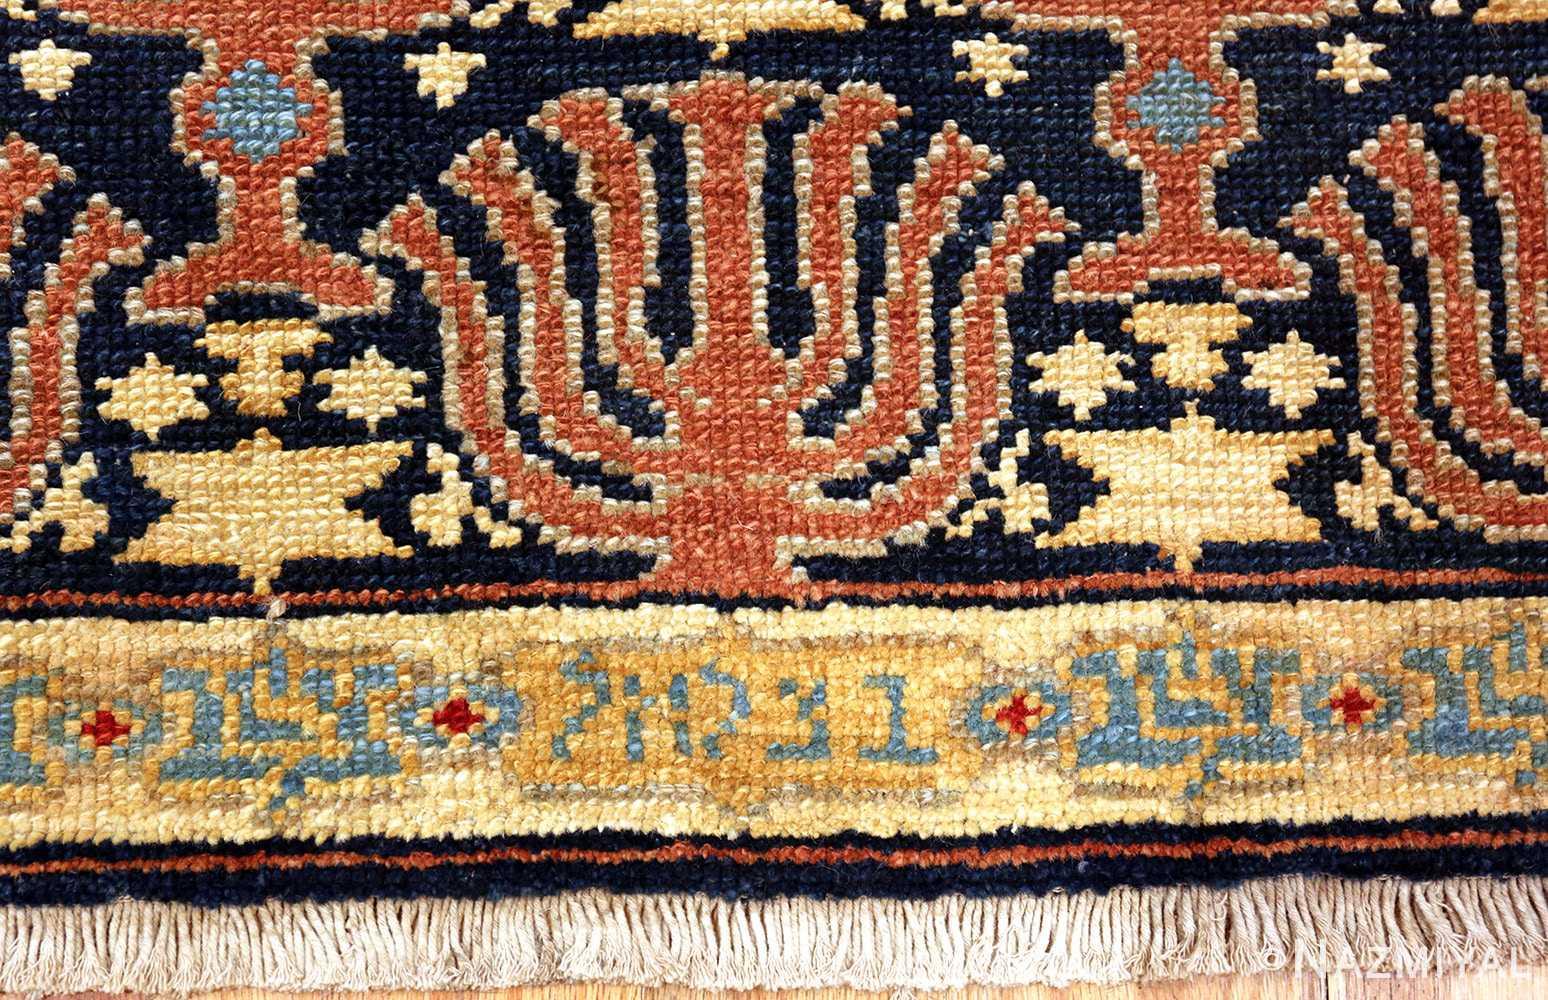 Small Blue Antique Israeli Bezalel Menorah Rug #49976 - Nazmiyal